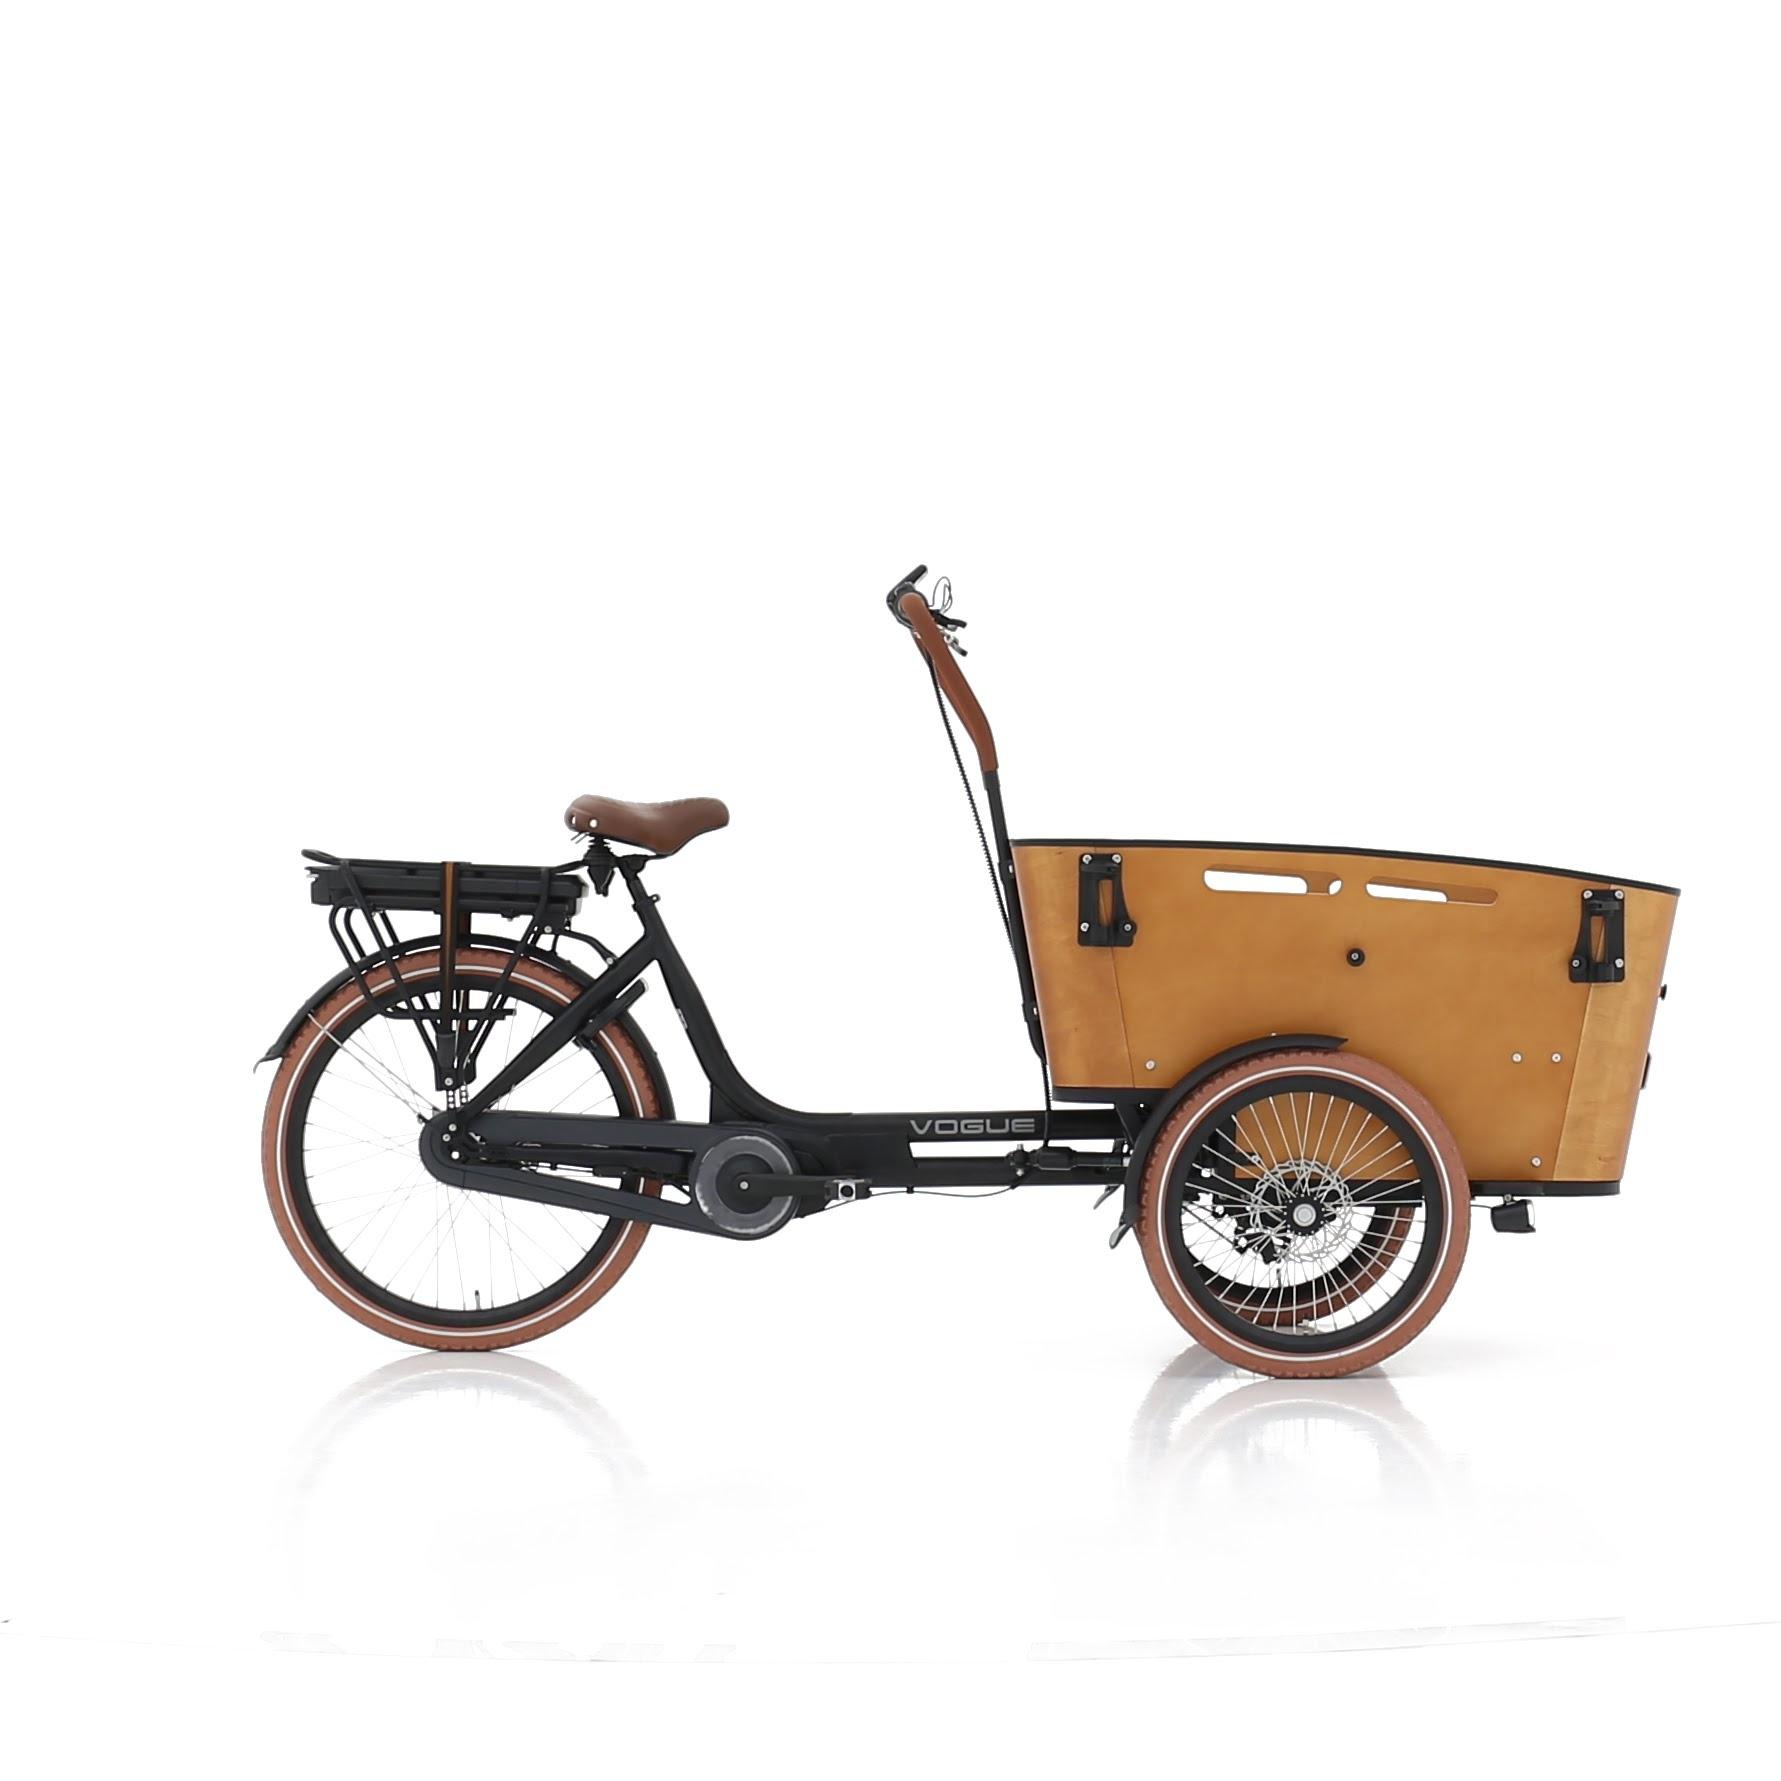 Vogue Carry 3 Bakfiets 49 cm Matt Black/Brown 7V